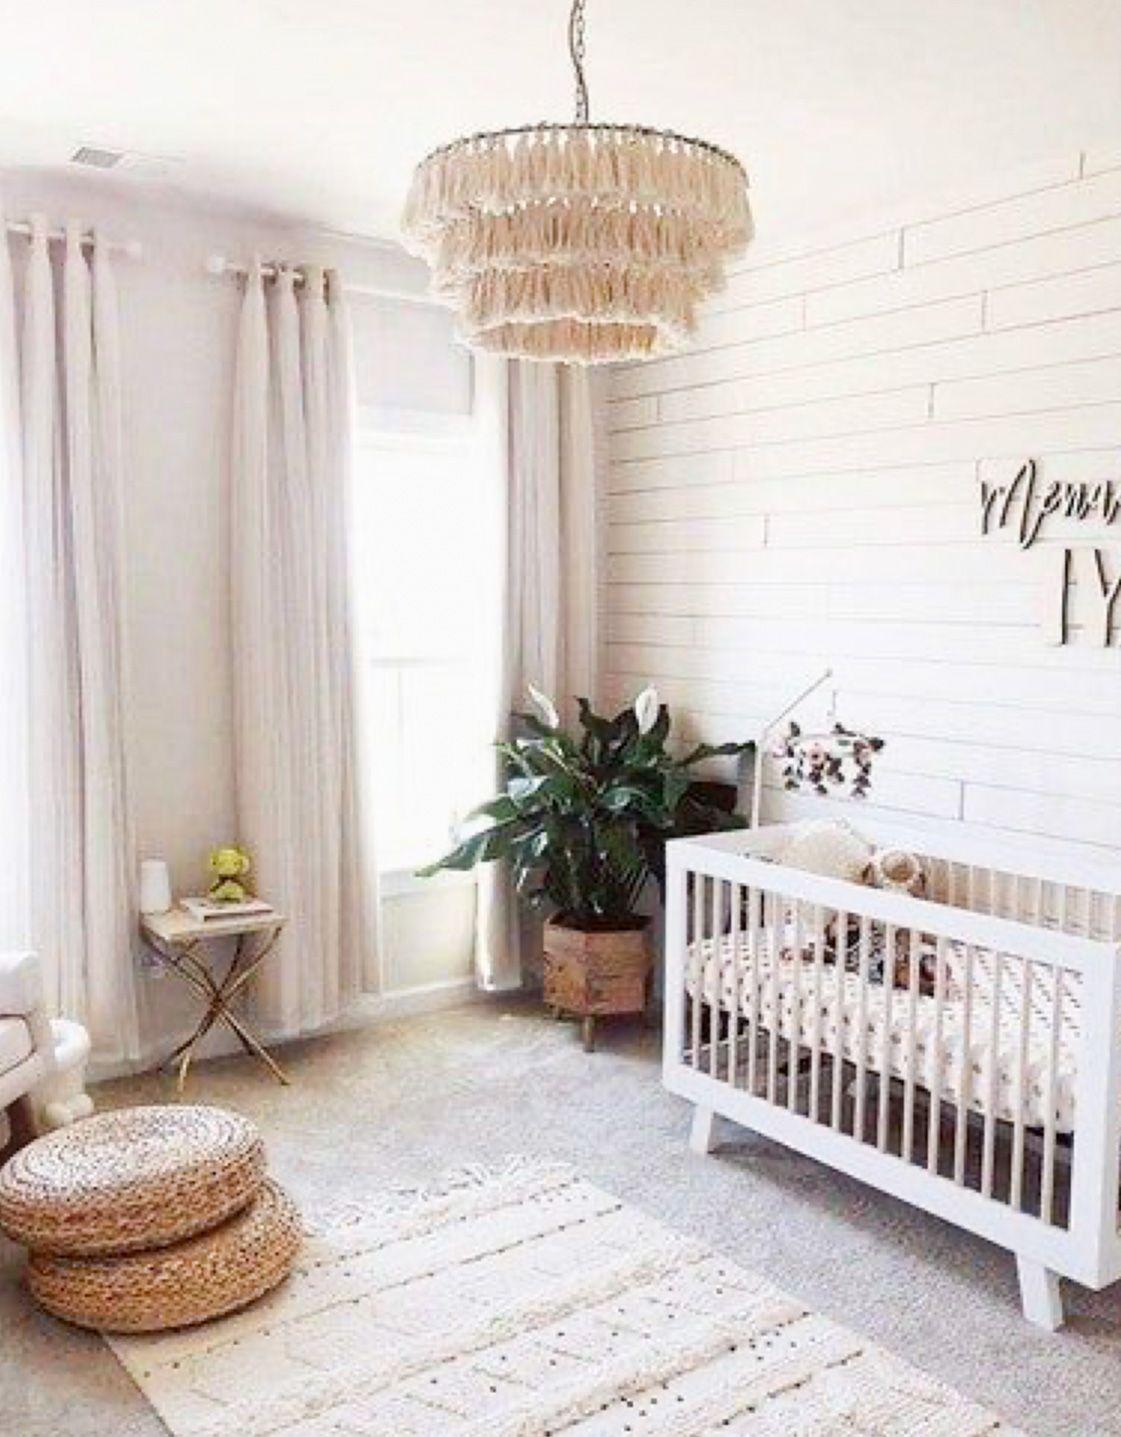 Playful and Chic Nursery Light Fixture Ceilings Ideas - DIY Darlin